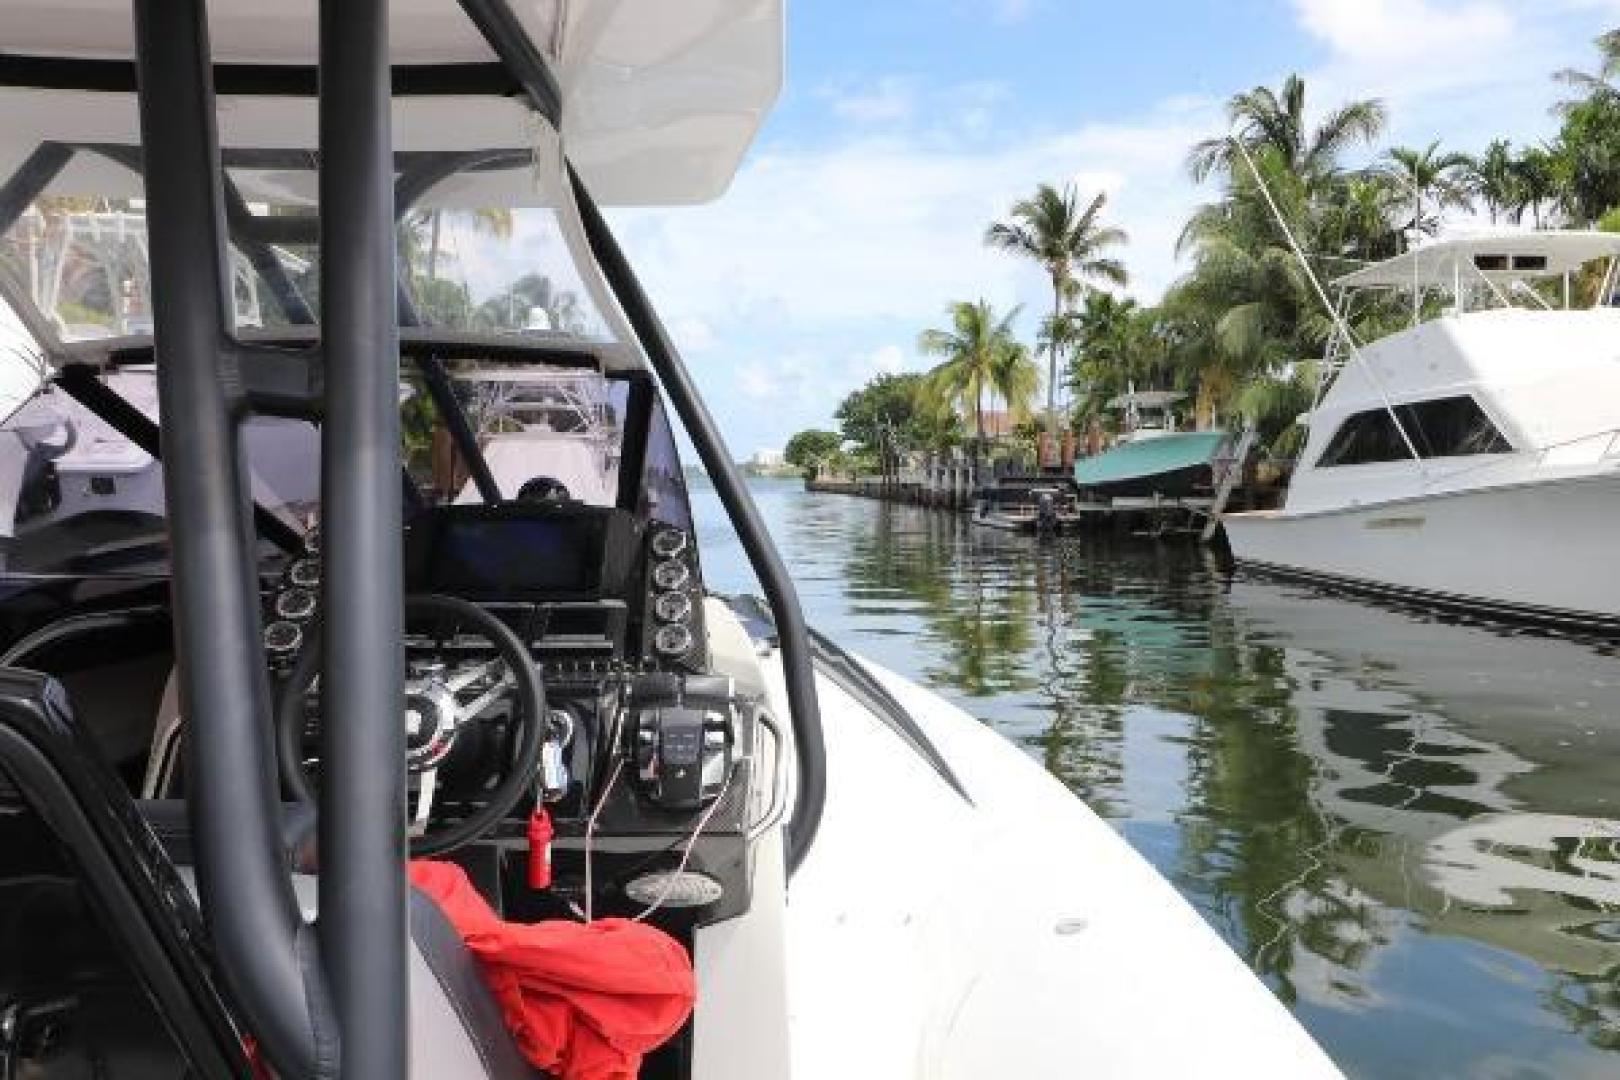 Sacs-Strider 40 ESSE R 2016-Sacs Strider 40 ESSE R Fort Lauderdale-Florida-United States-1533420   Thumbnail